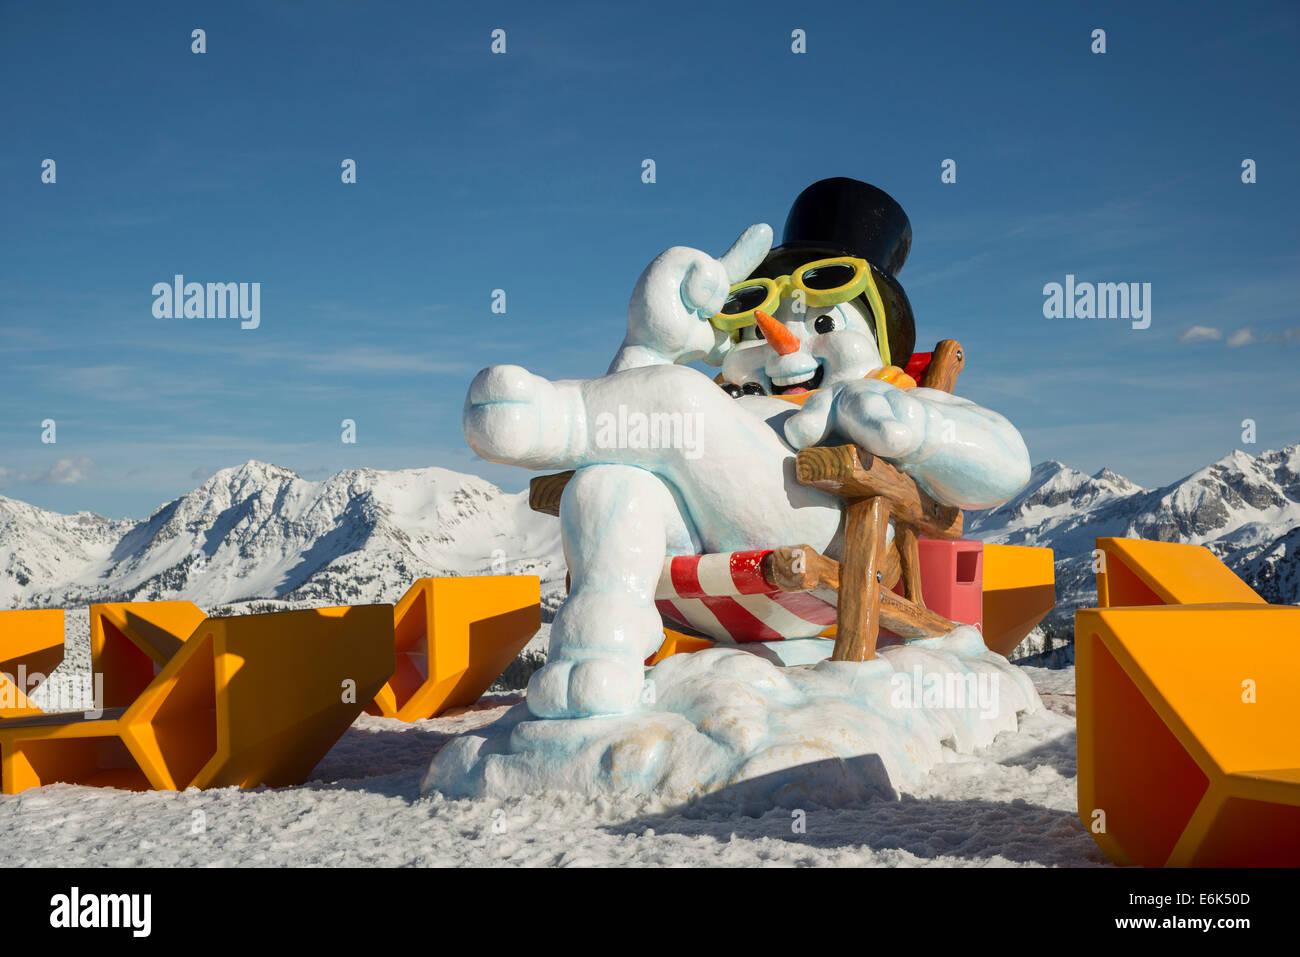 Oversized snowman sculpture at Gamskogel at the Rosskopf mountain station, Zauchensee, Pongau, Tauern, Salzburg, - Stock Image